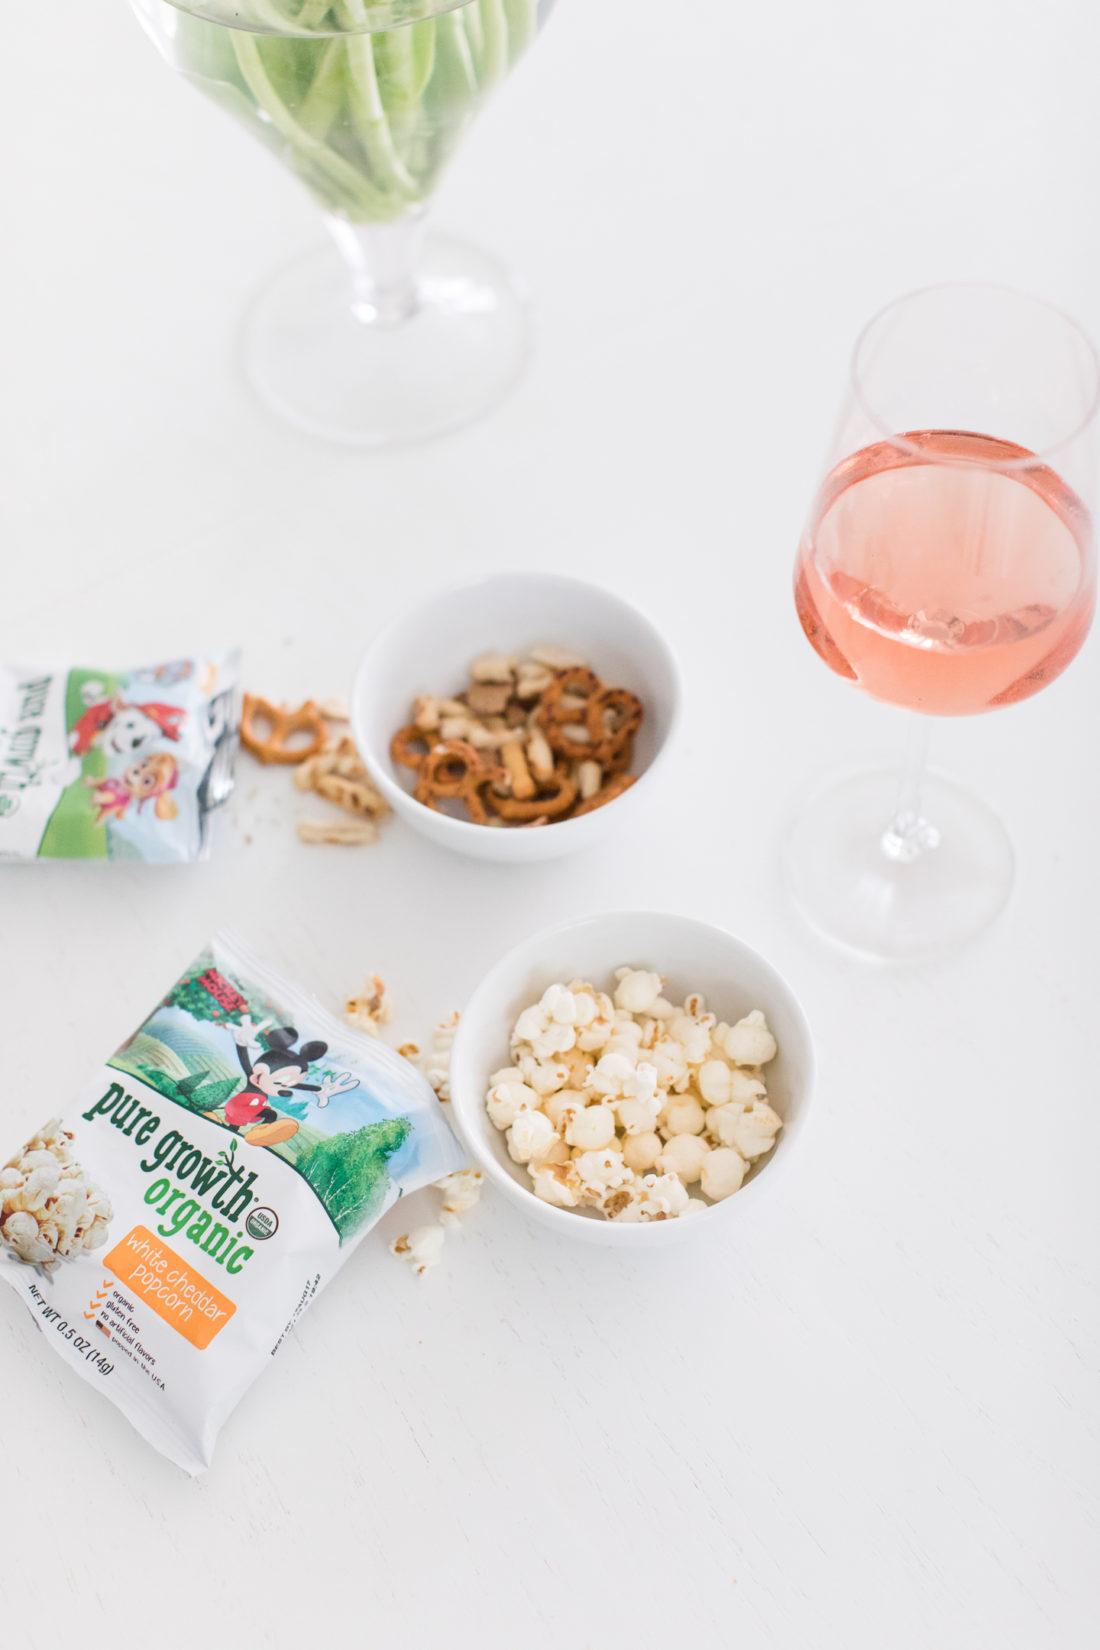 Eva Amurri Martino uses Pure Growth organic snacks as bar treats for Mama Happy Hour